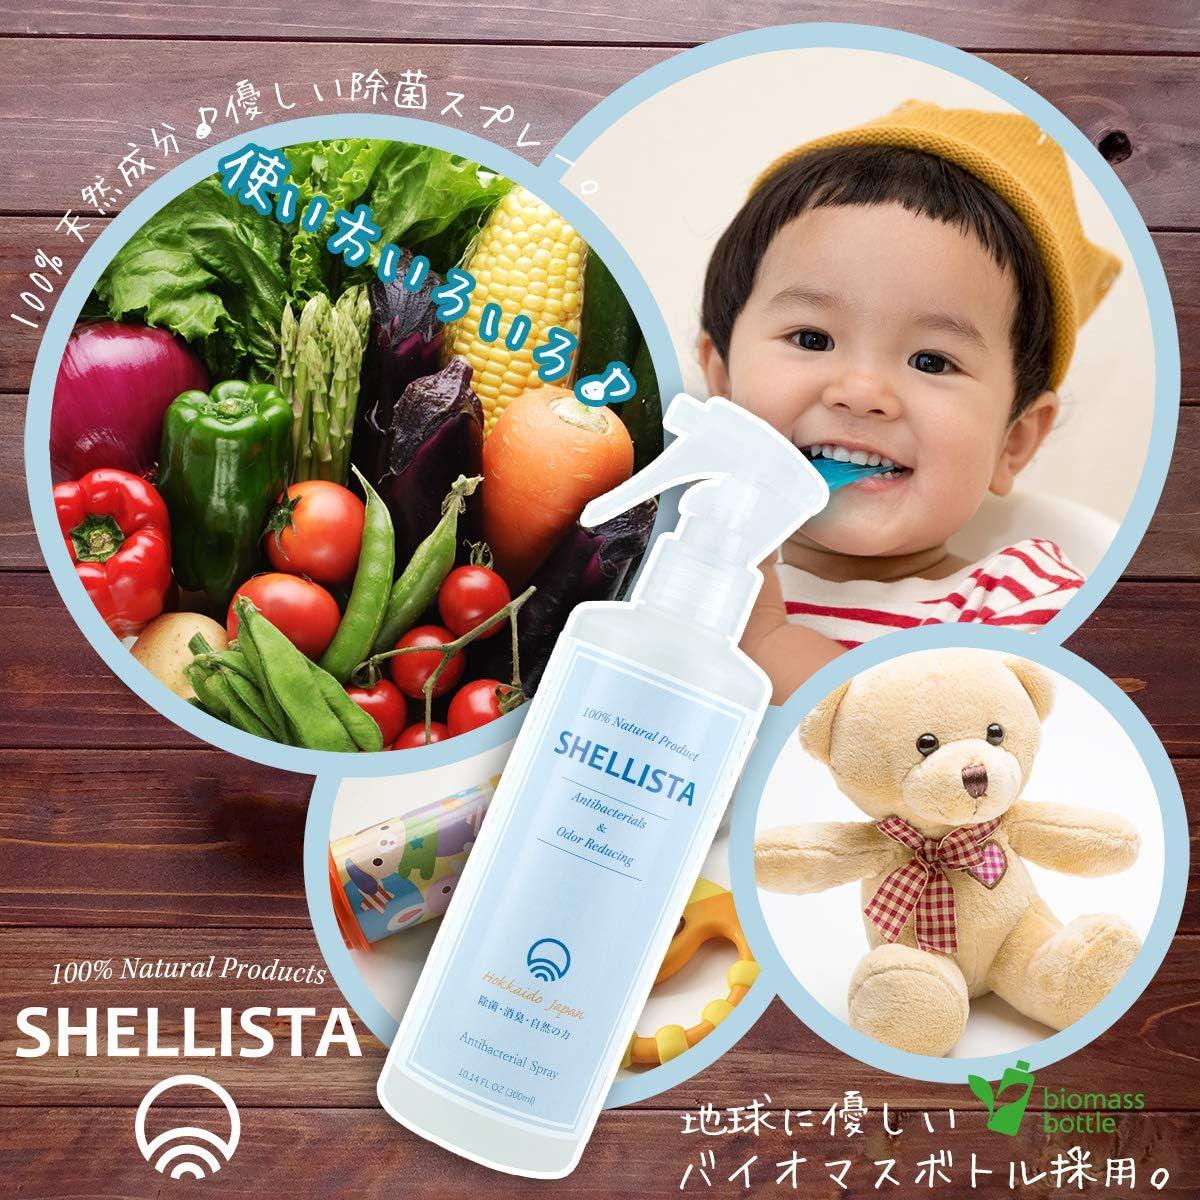 SHELLISTA(シェリスタ) 除菌 消臭 スプレー 無添加 無香料